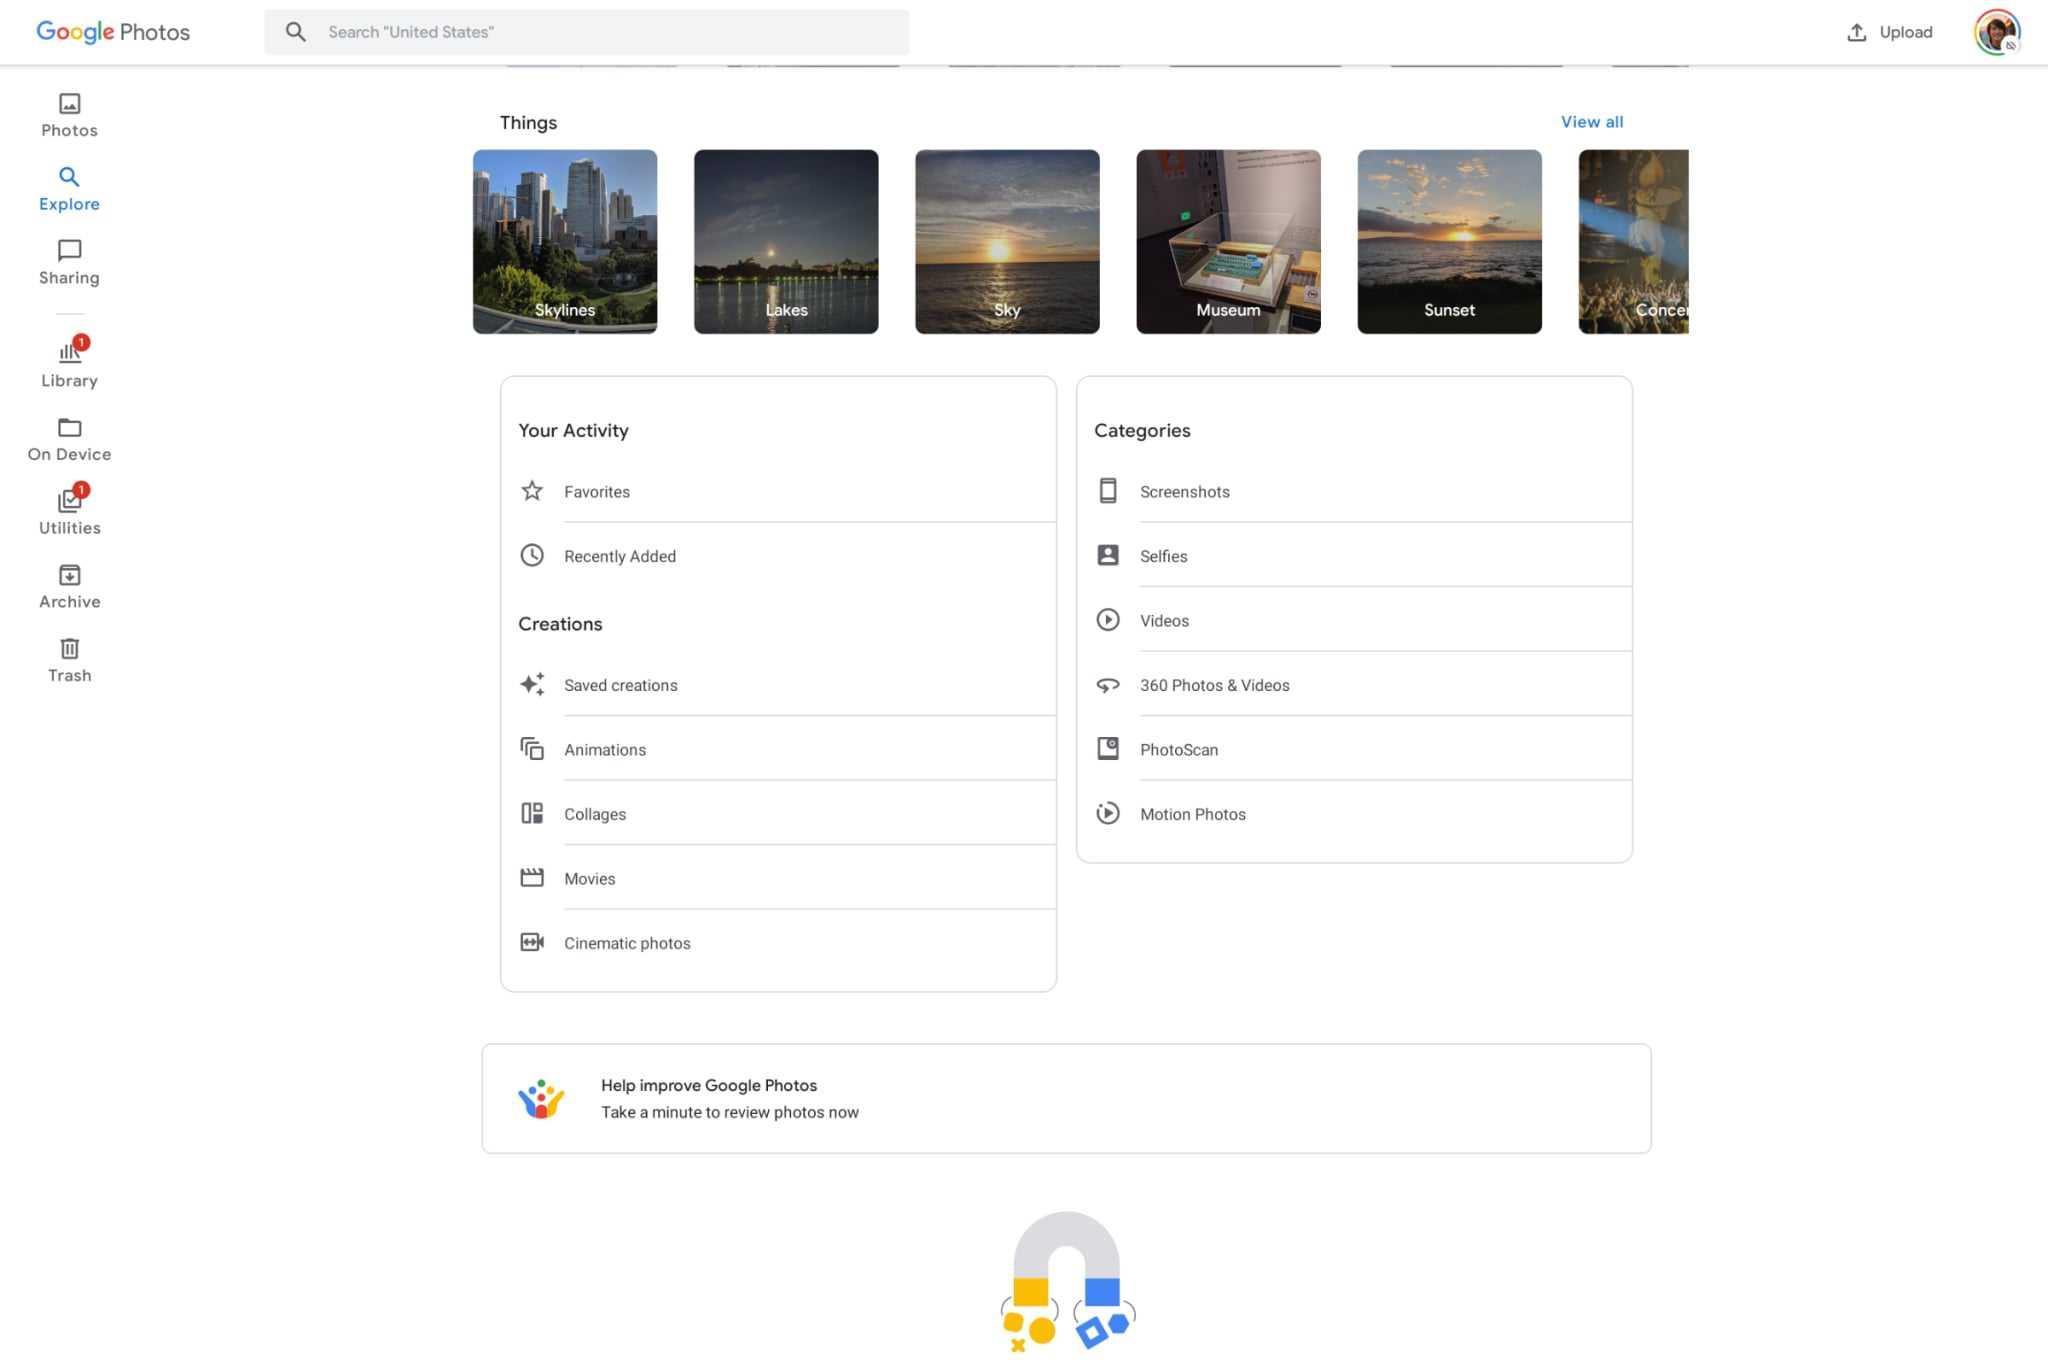 google photos tablet optimized interface 2